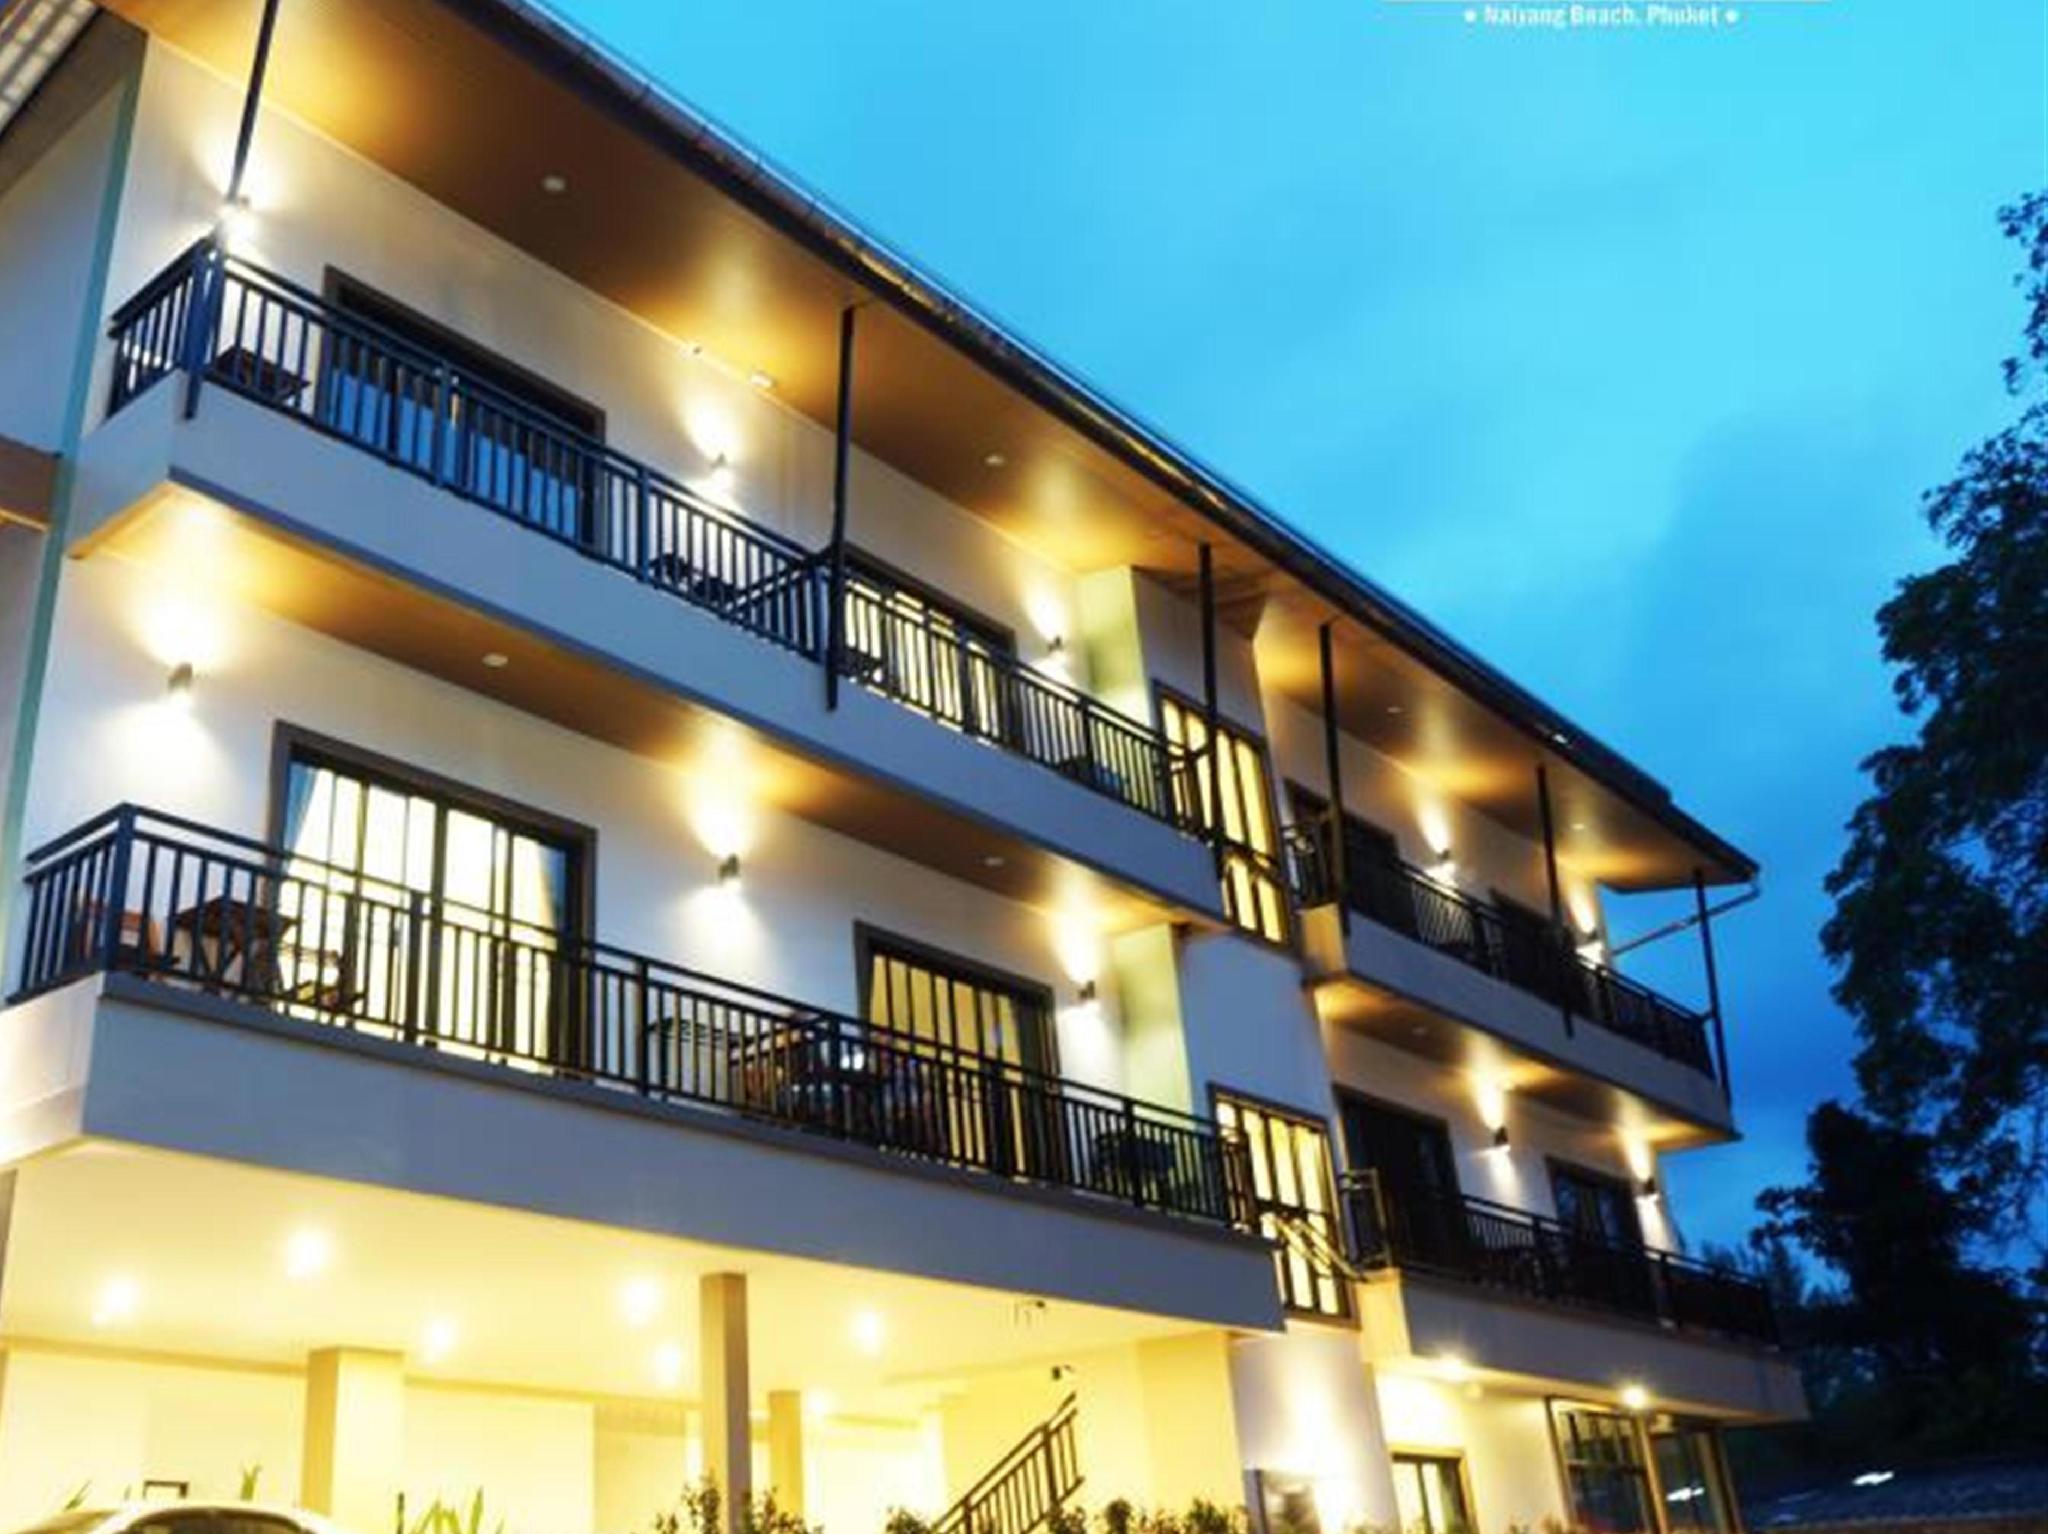 Pensiri House Puketas